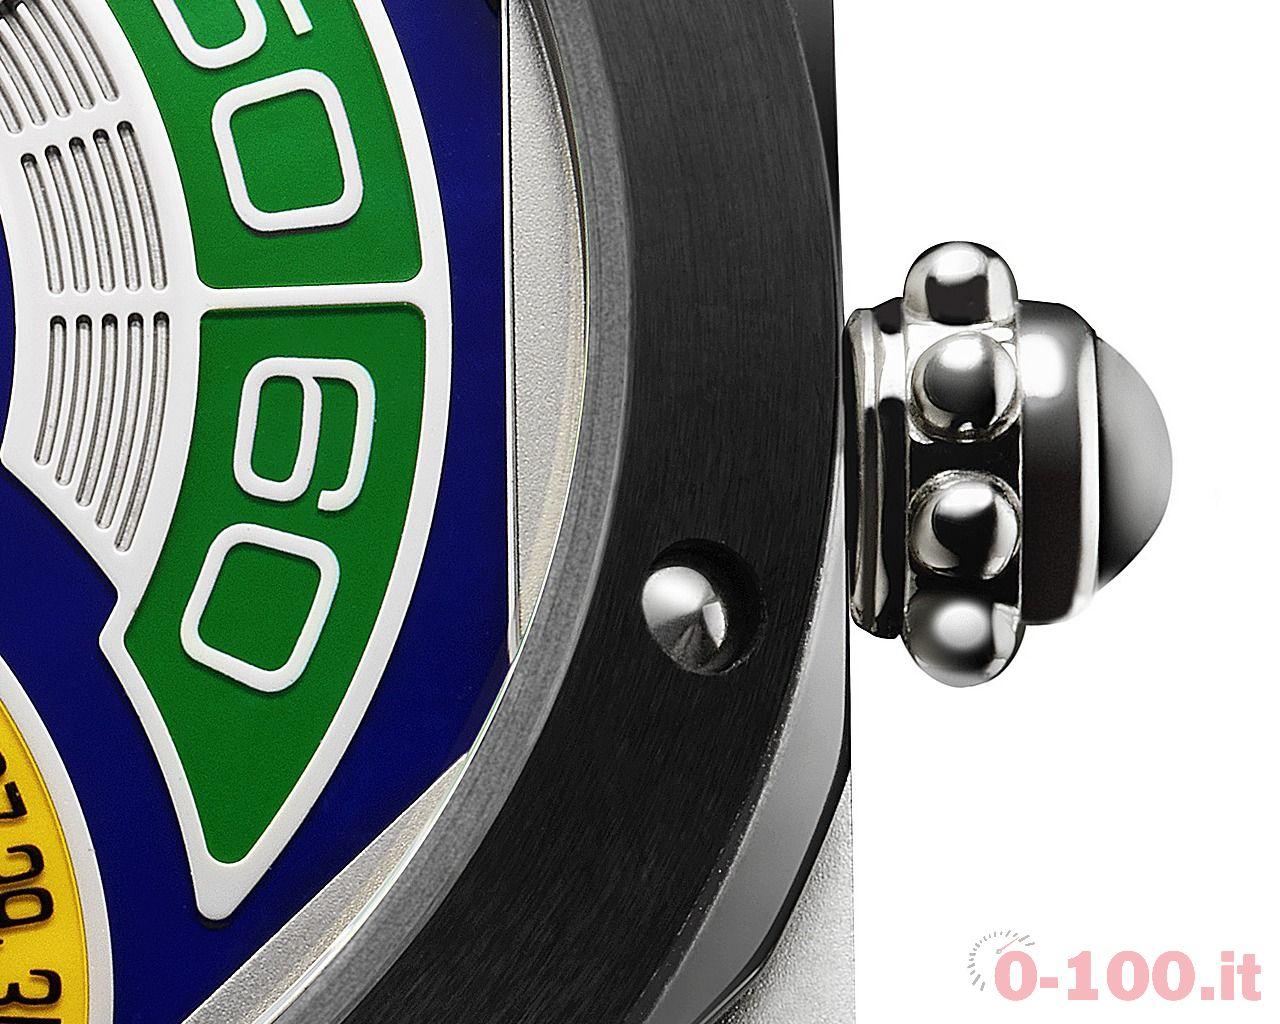 bulgari-octo-bi-retro-brazil_0-1005